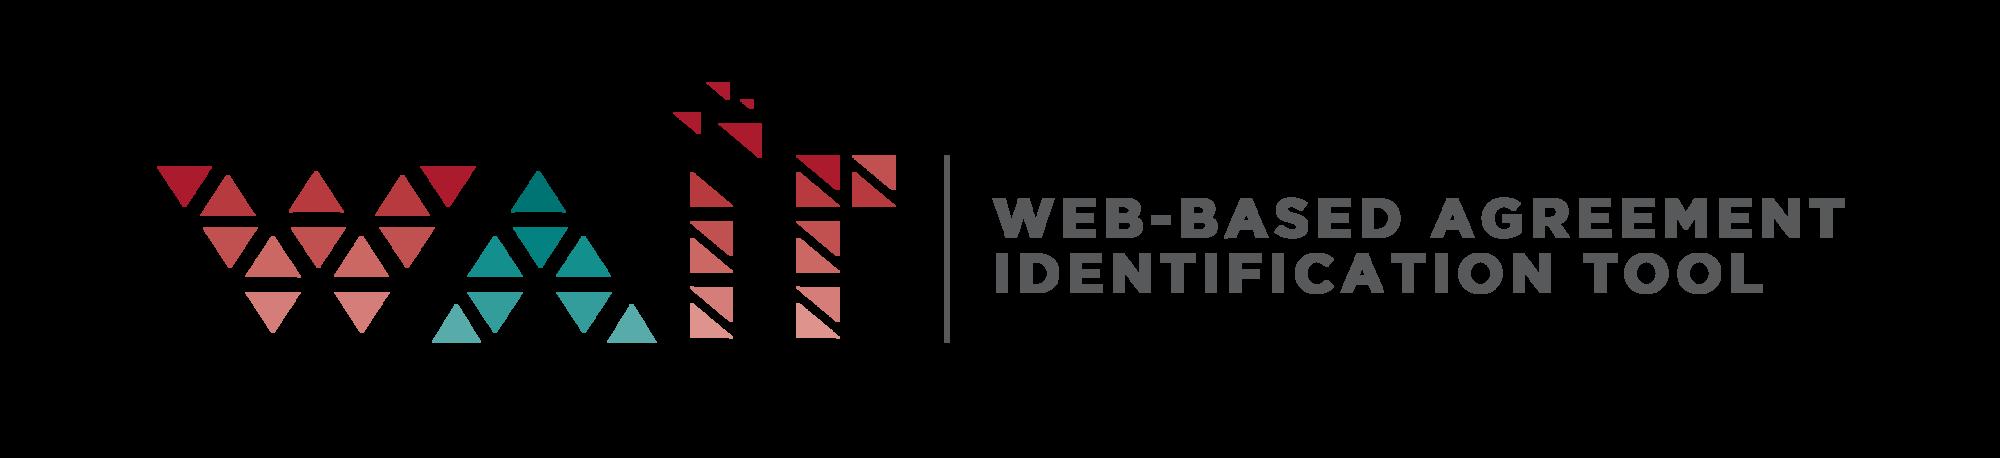 Web-based Agreement Identification Tool.